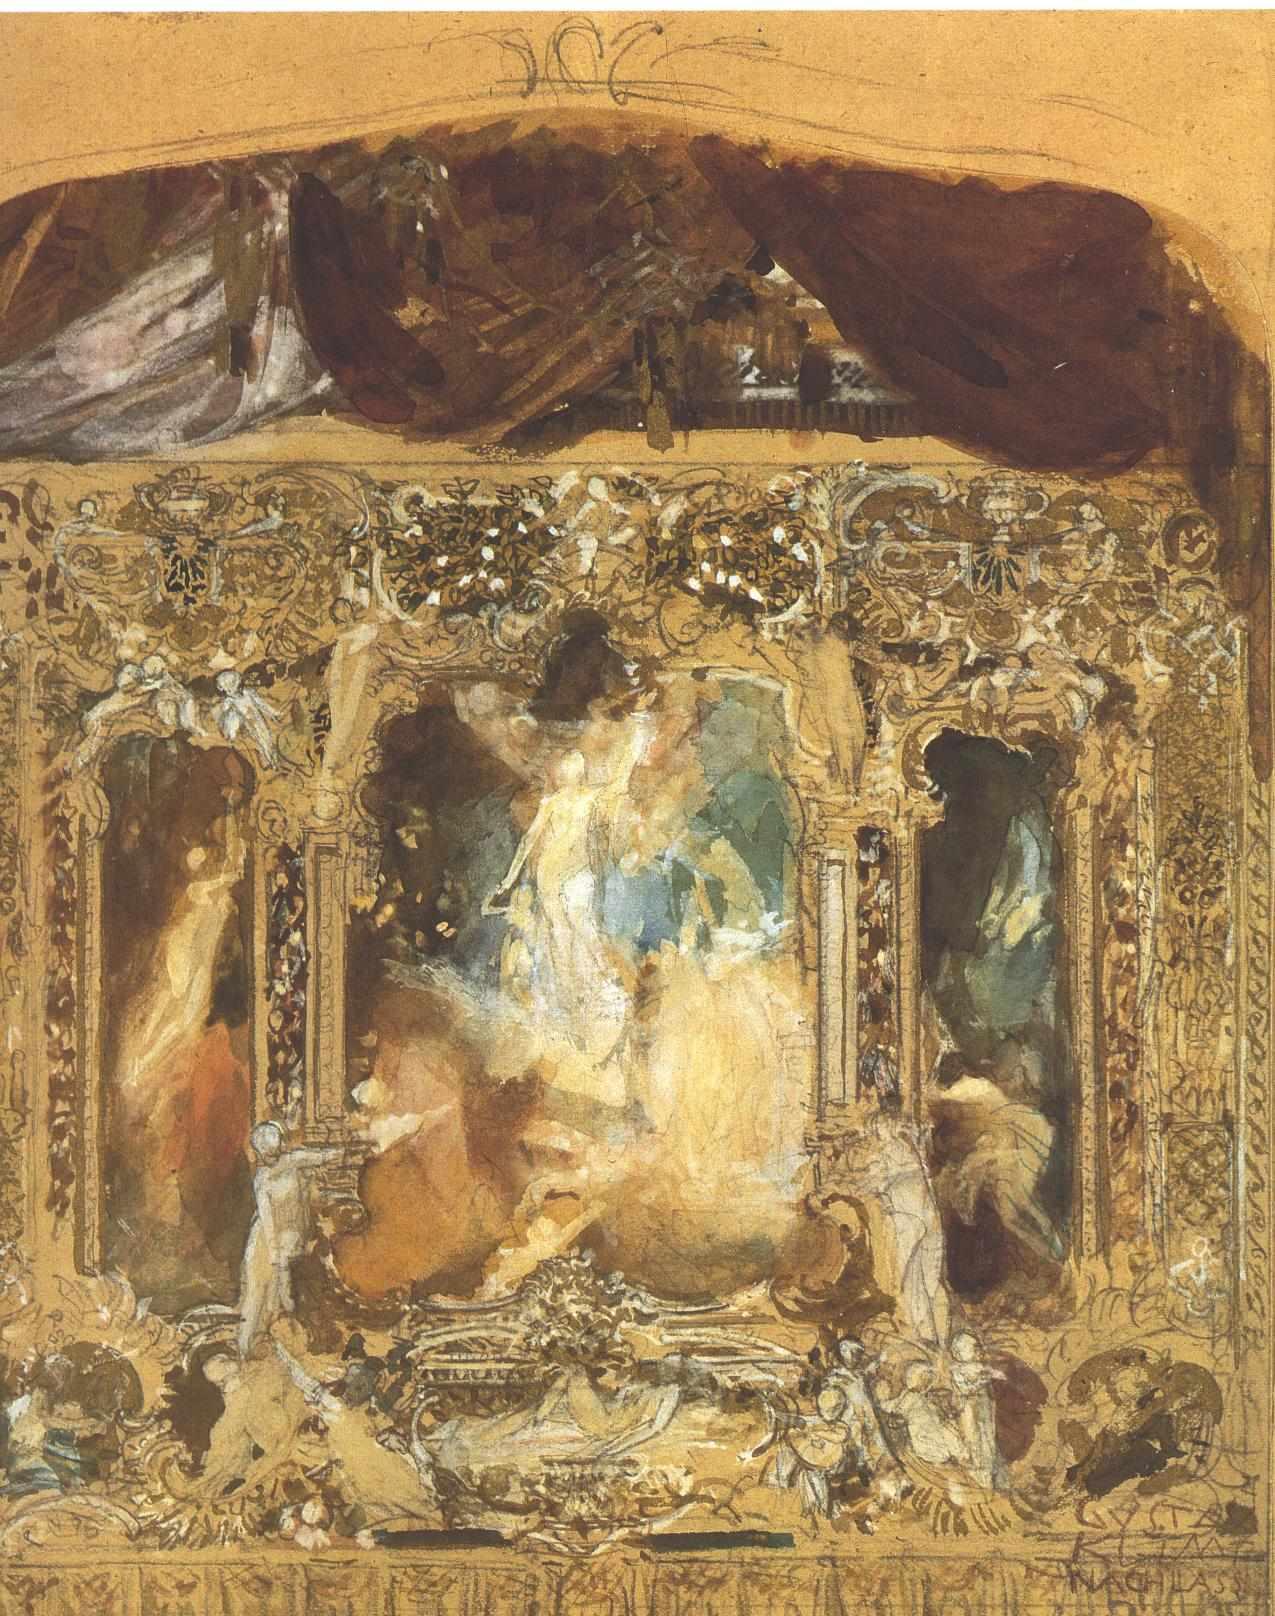 Design for a theater curtain 1883 gustav klimt for Riproduzioni design